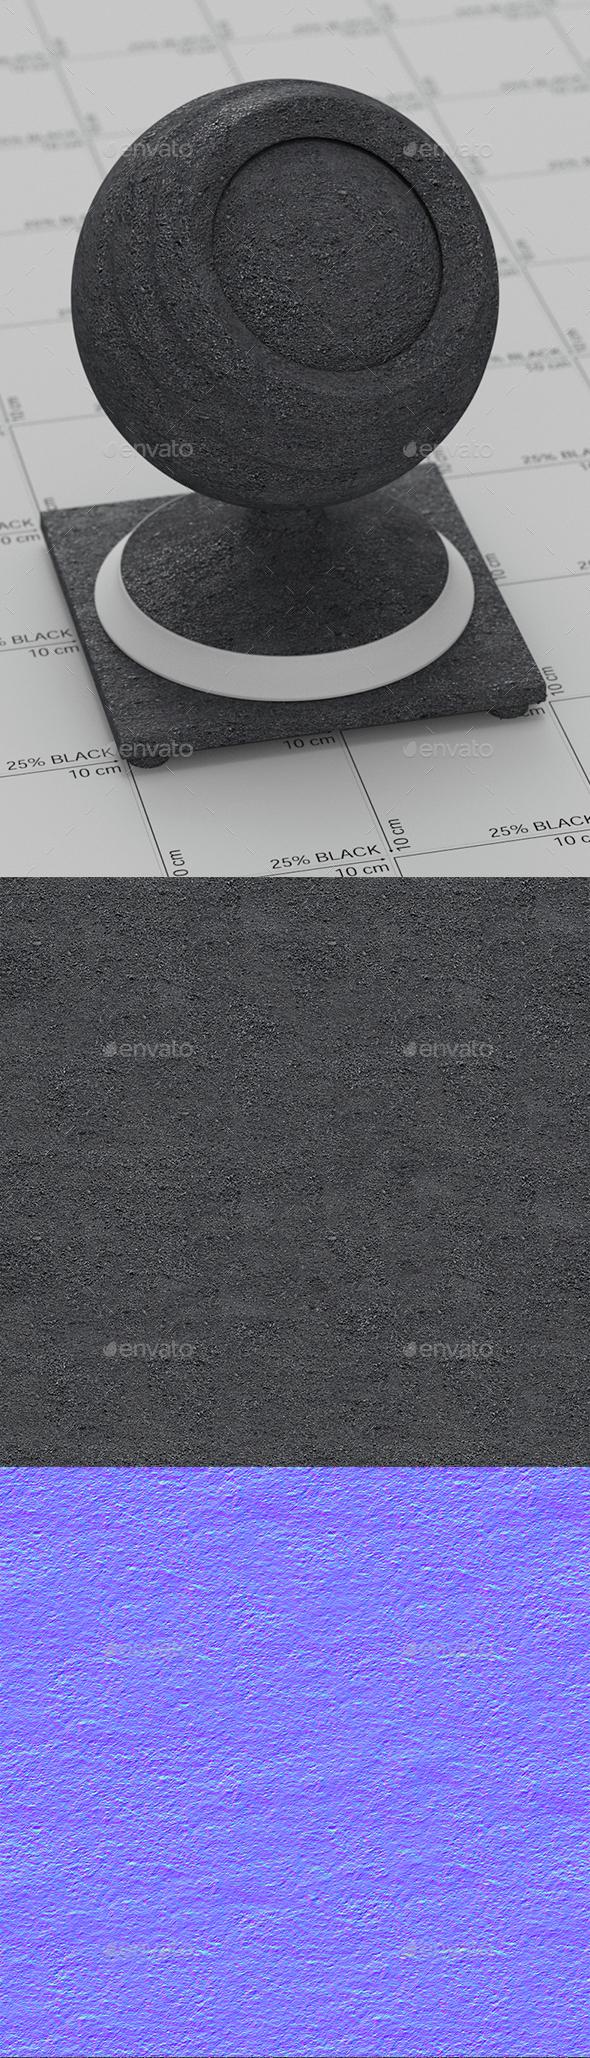 Seamless Asphalt Texture - 3DOcean Item for Sale